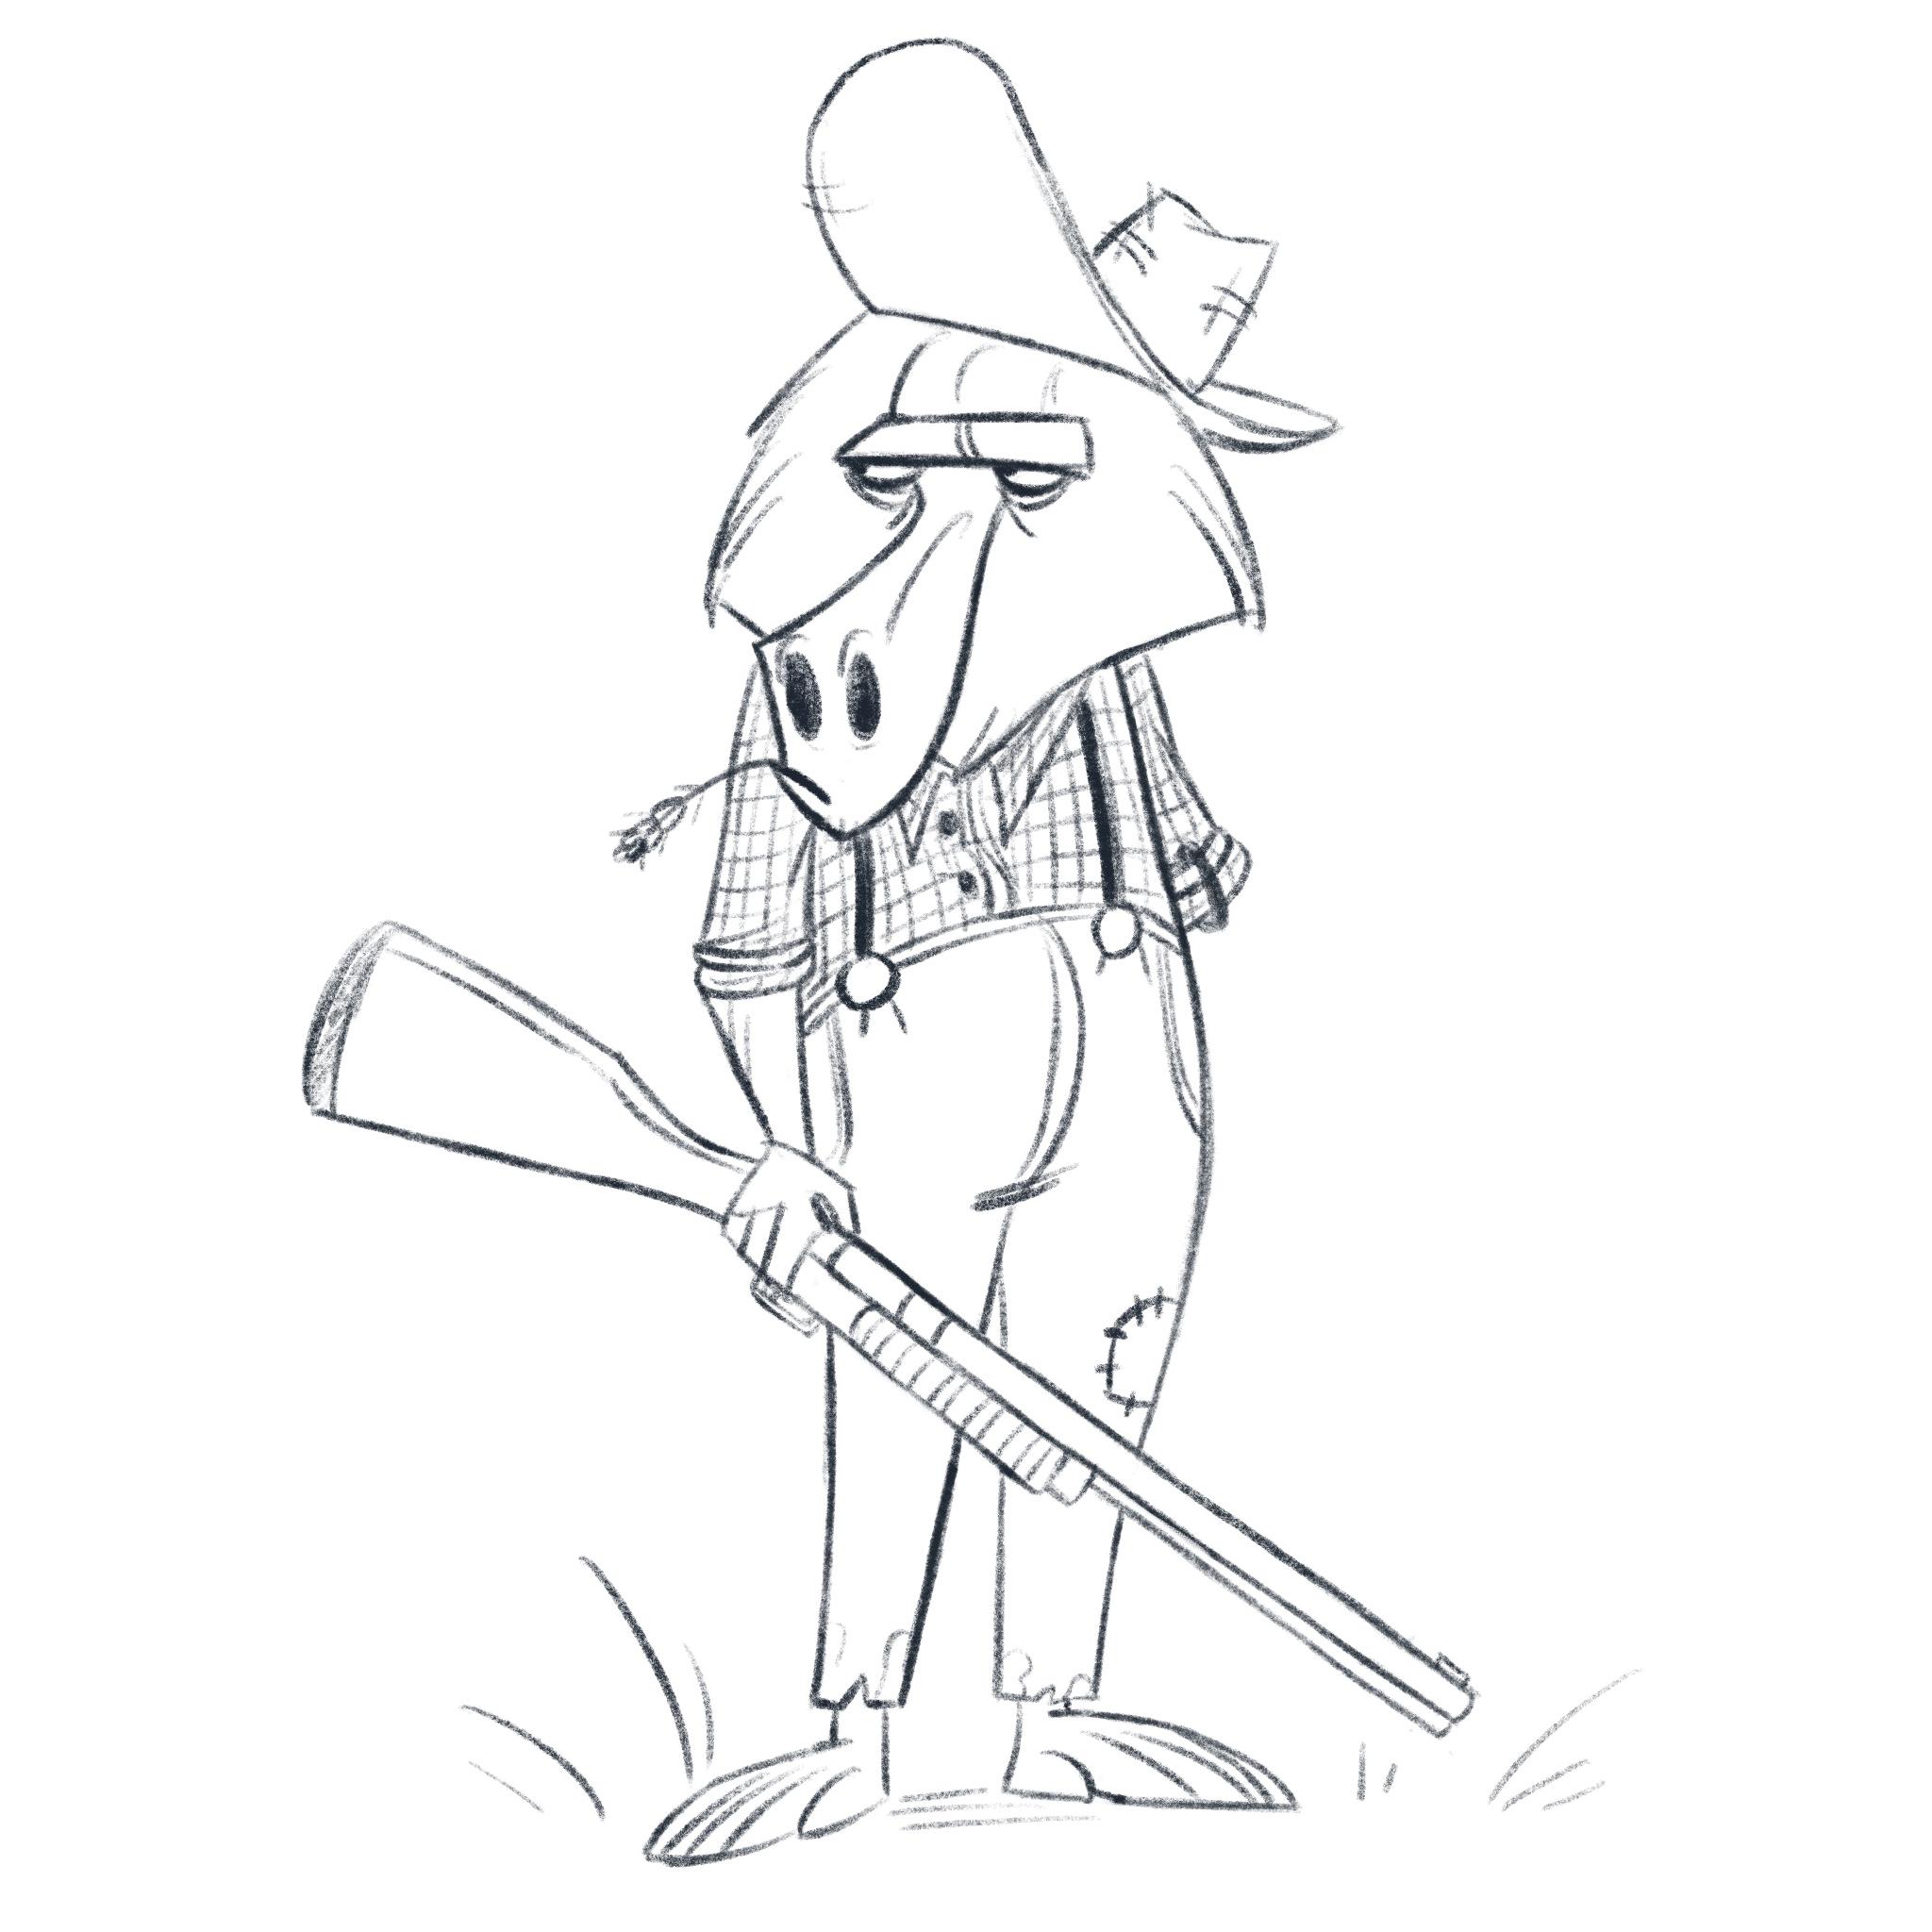 Baboon farmer